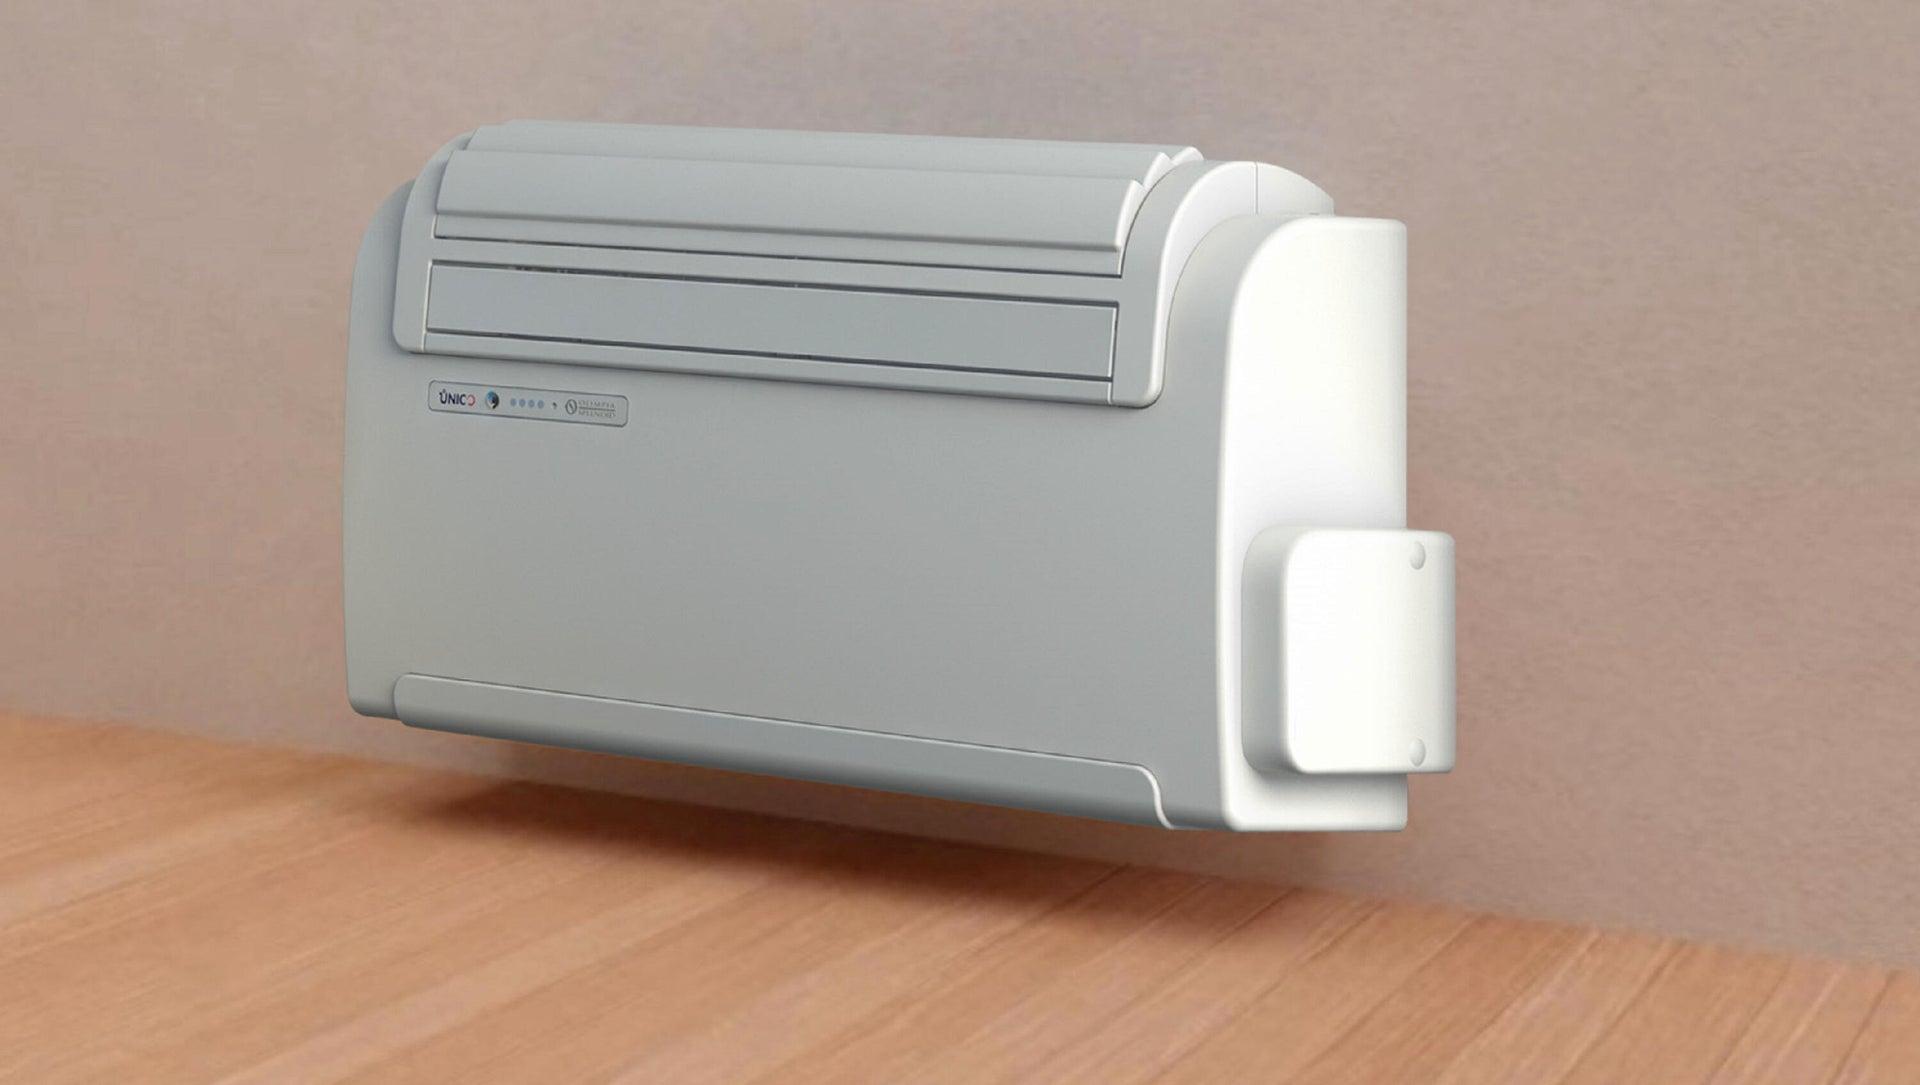 Climatizzatore fisso dualsplit OLIMPIA SPLENDID Unico Master 9000 BTU - 2